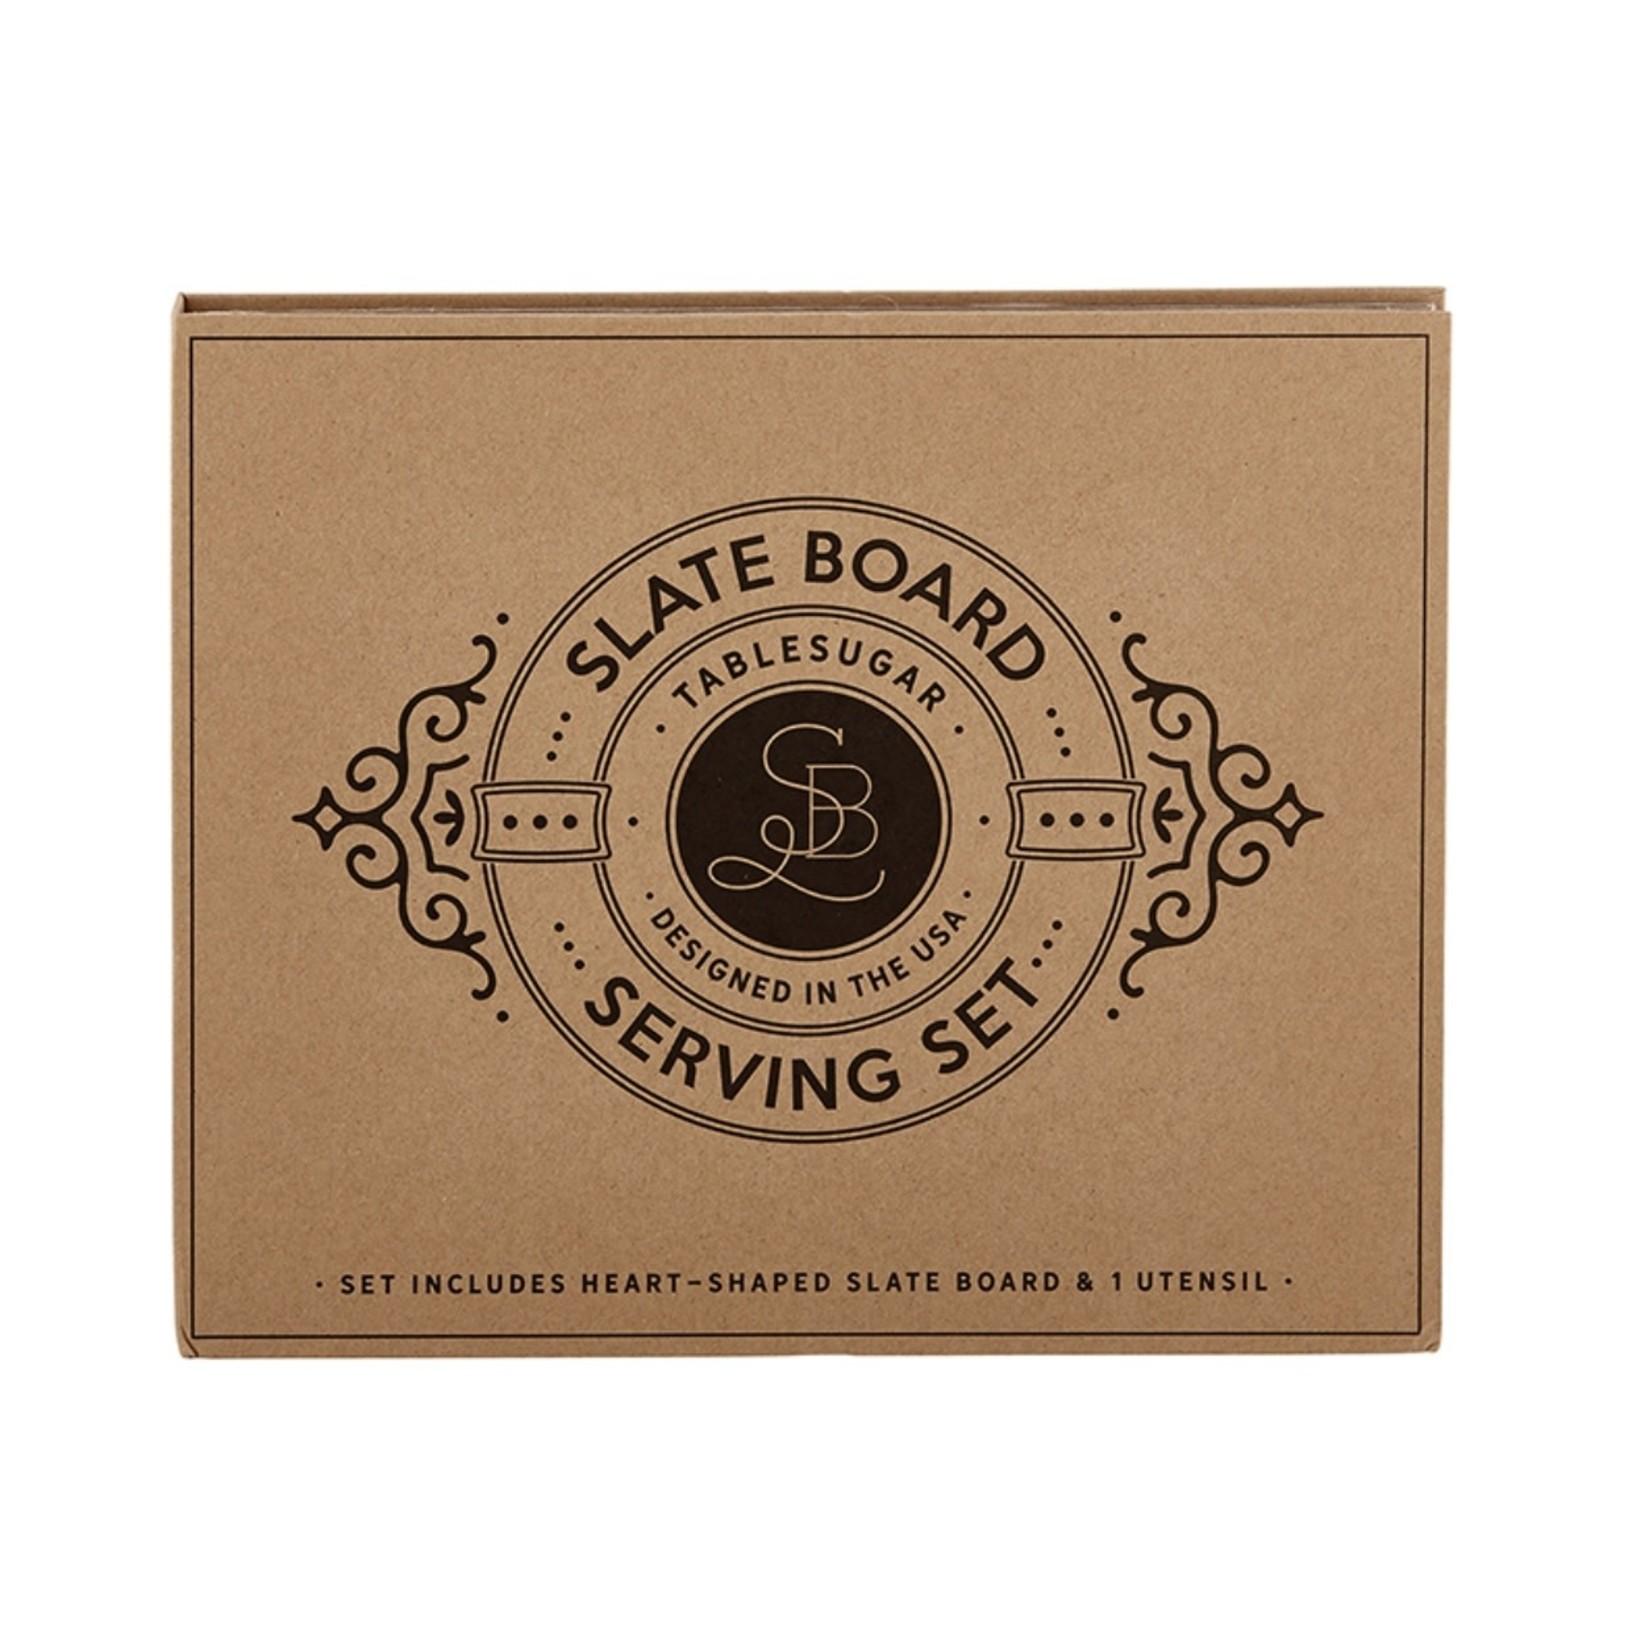 Santa Barbara Designs Slate Board Serving Set